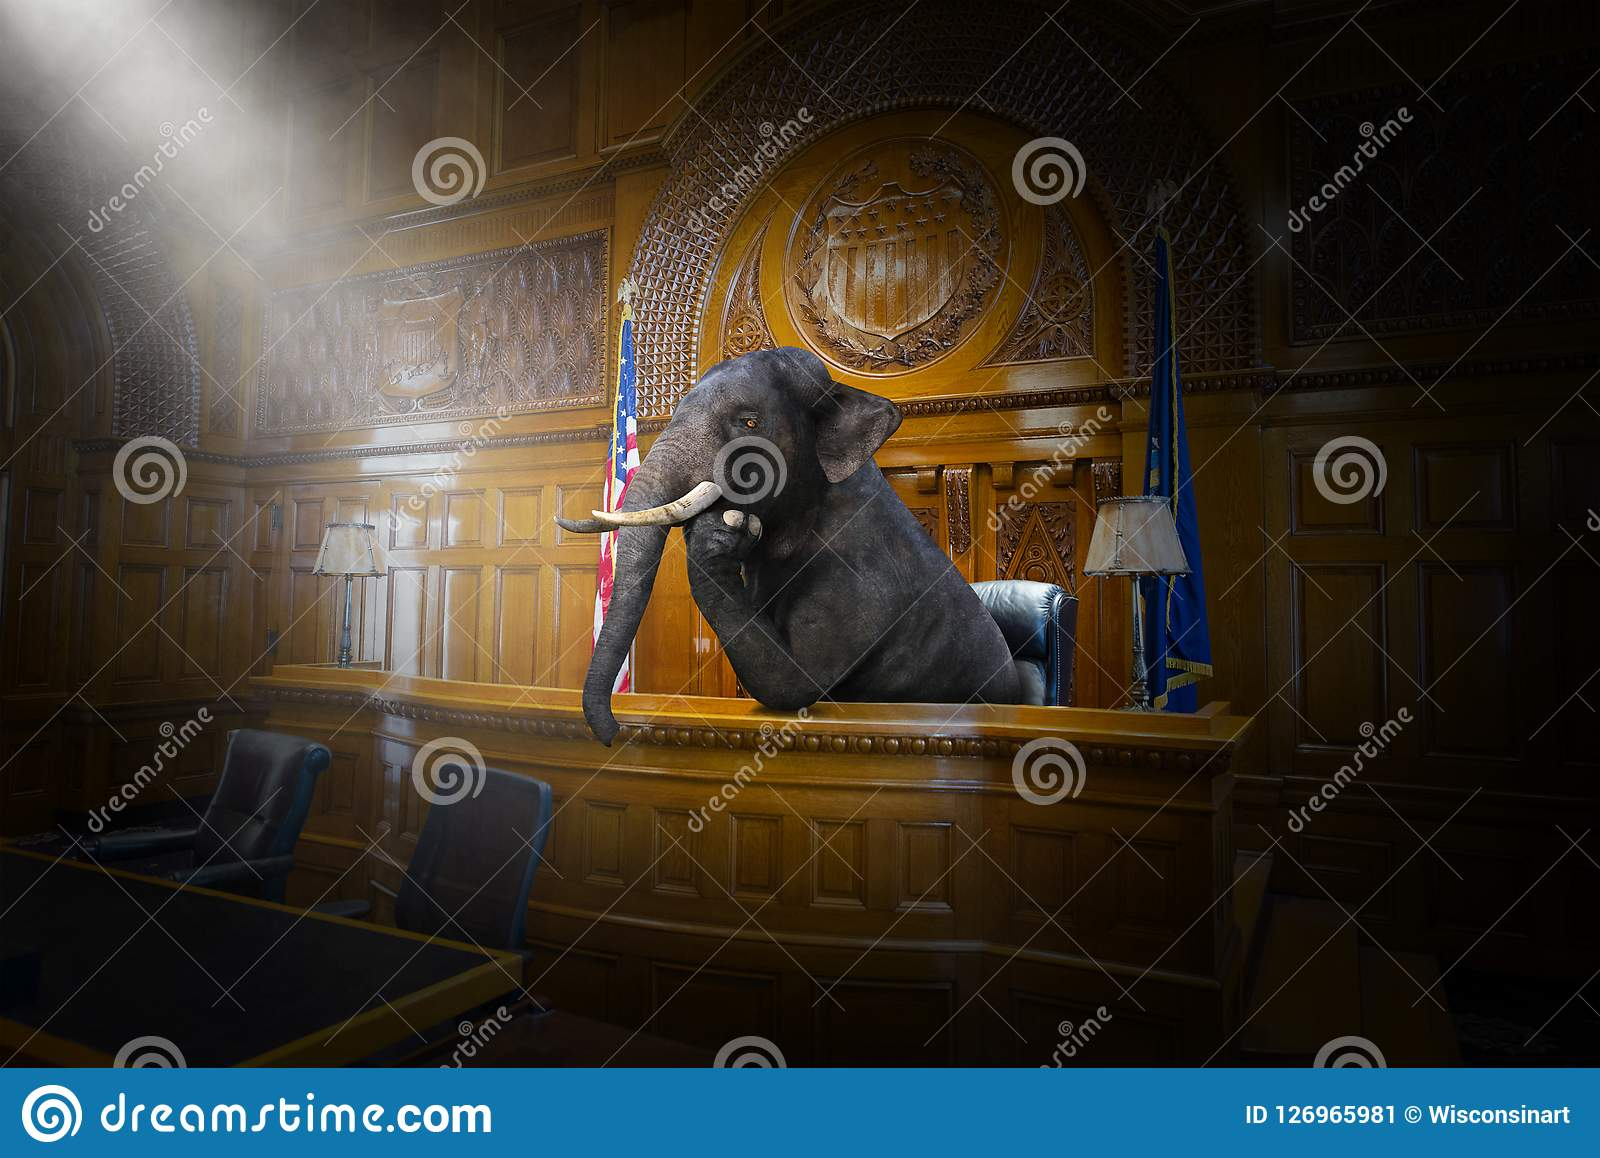 Rolig overklig elefantdomare, advokat, rättssal, lag